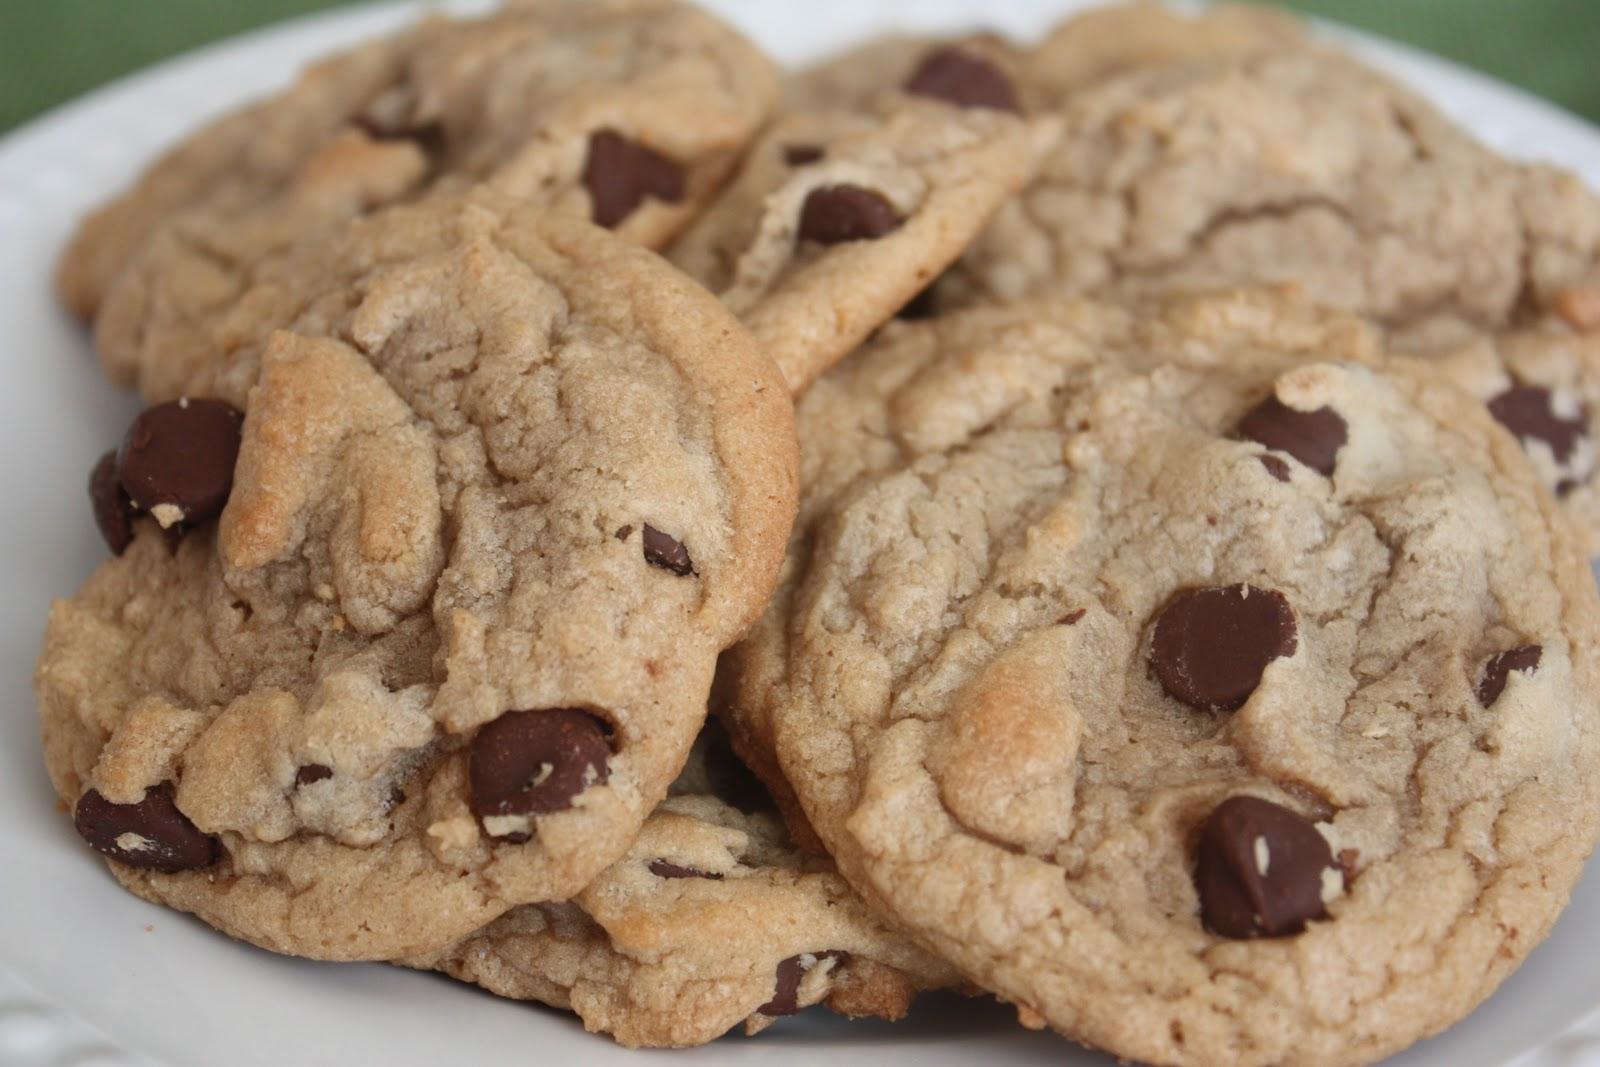 My Favorite Recipes: Brown Sugar Chocolate Chip Cookies